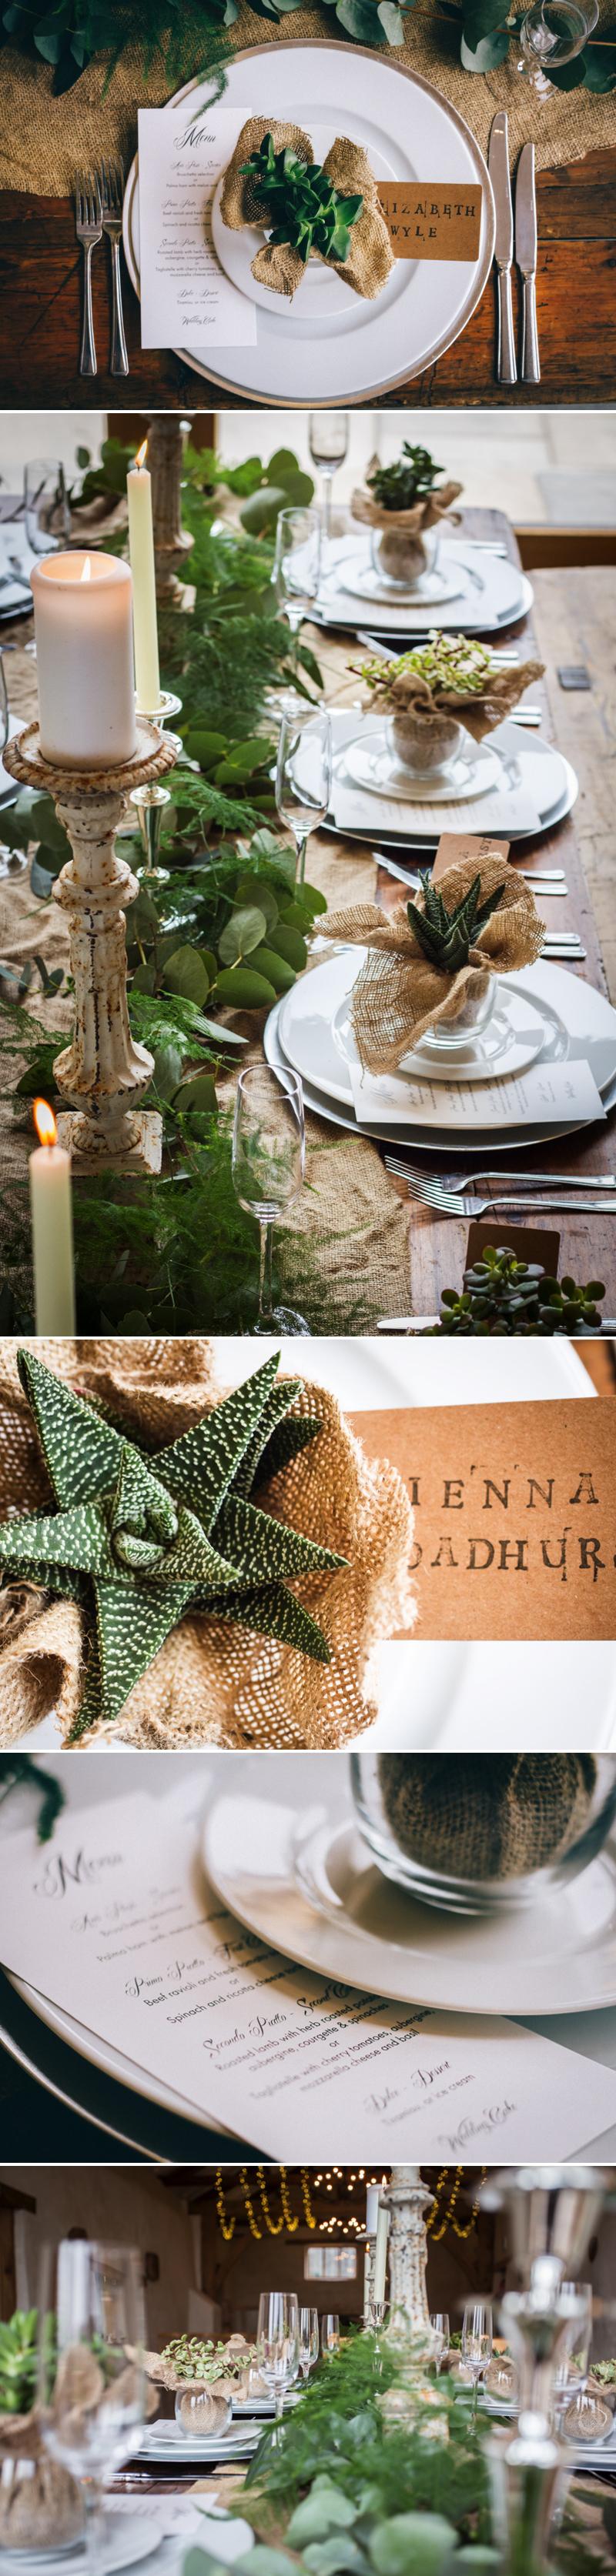 wedding-venues-in-devon-uk-wedding-venue-directory-upton-barn-and-walled-garden-rustic-inspired-styled-shoot-coco-wedding-venues-001